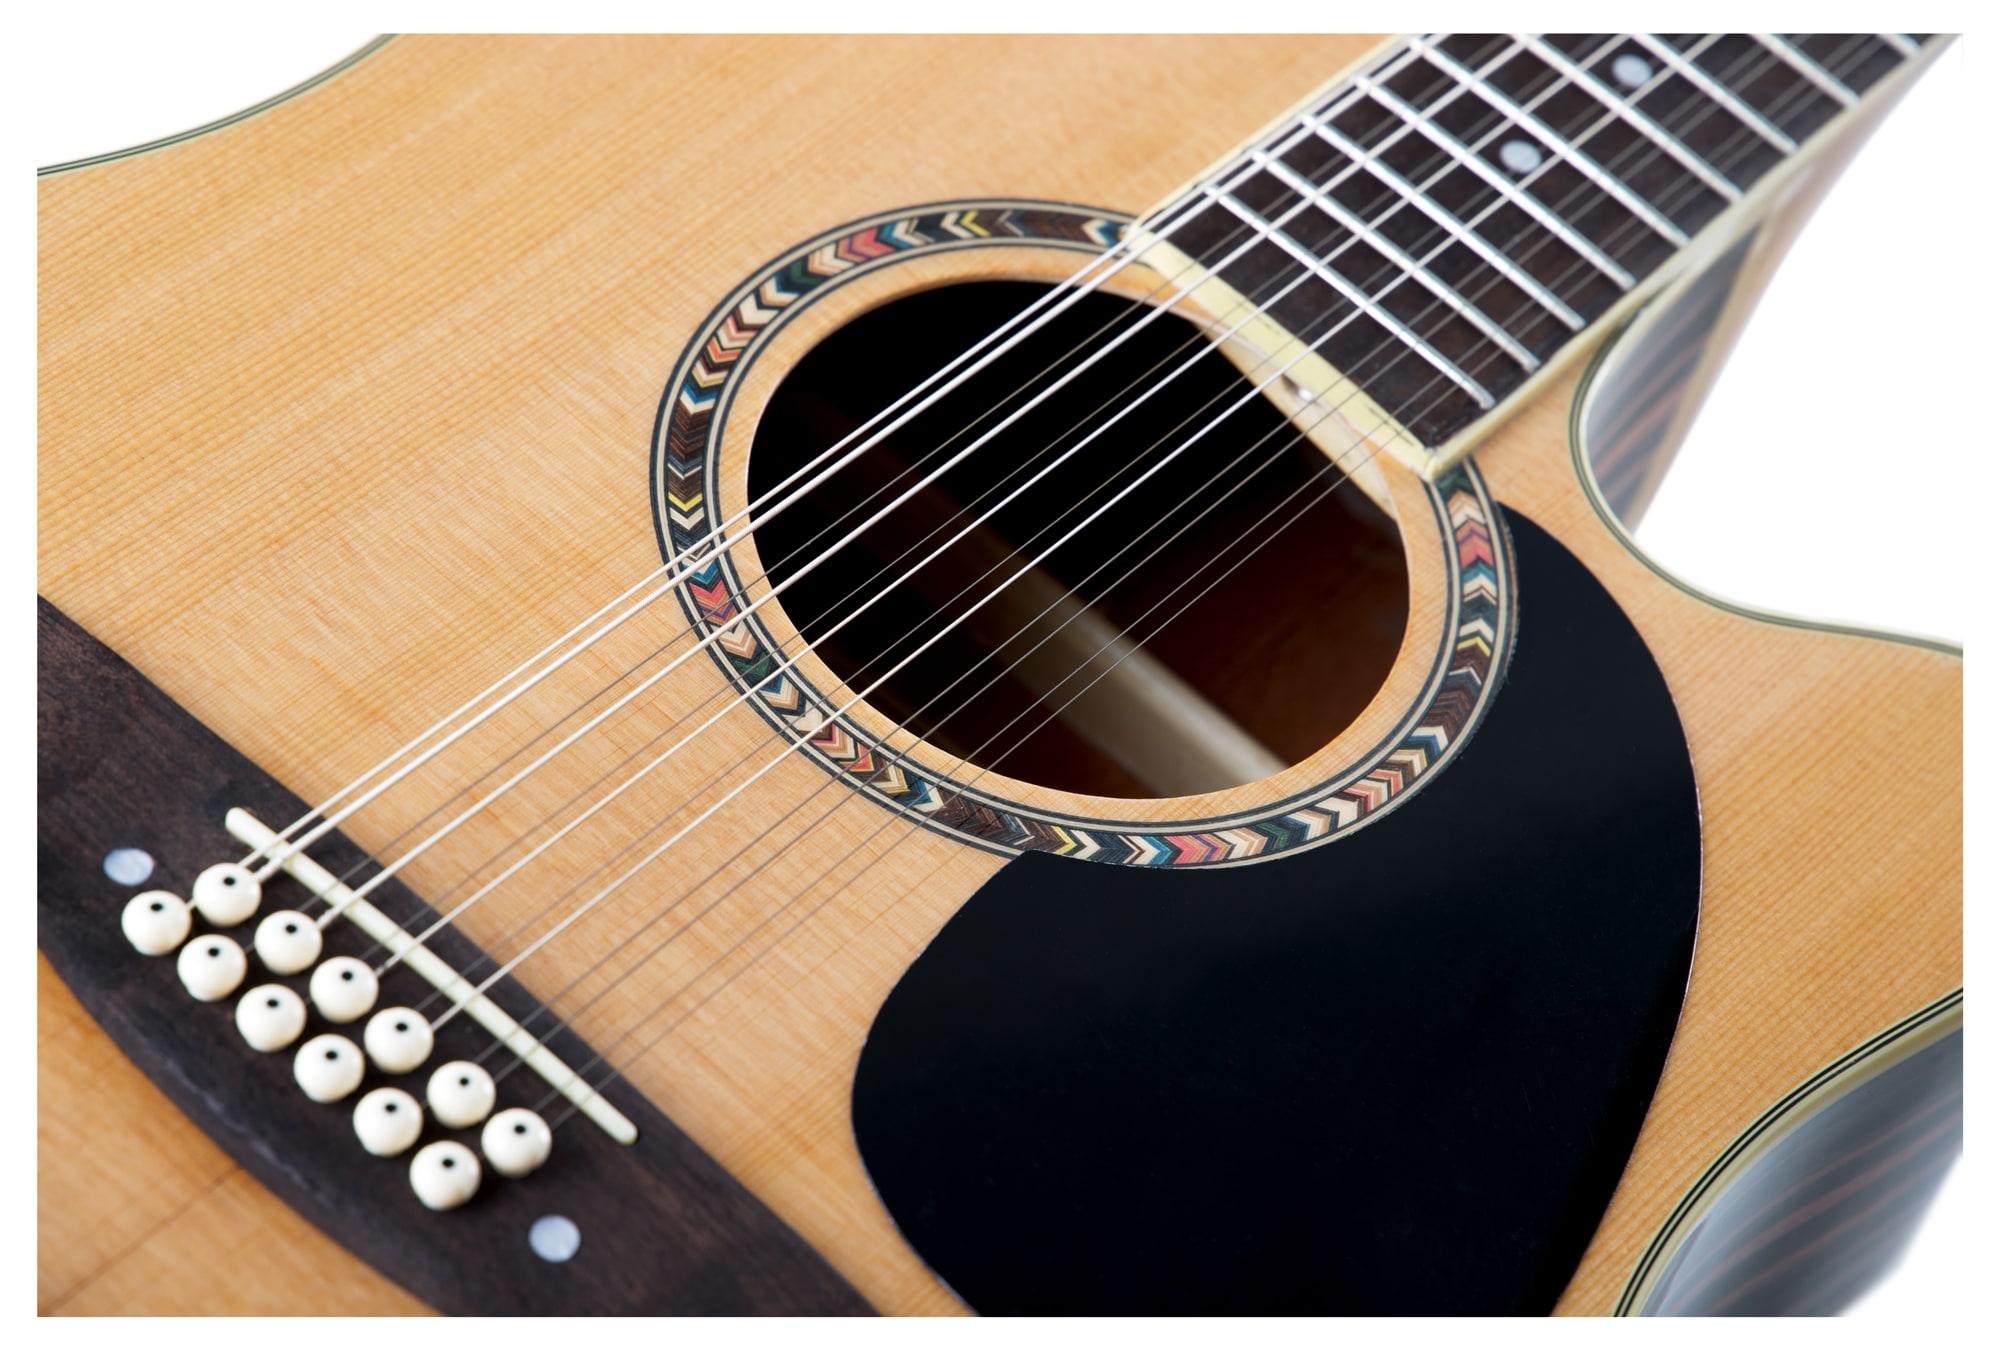 Chitarra folk classic cantabile ws 12 12 corde legno naturale